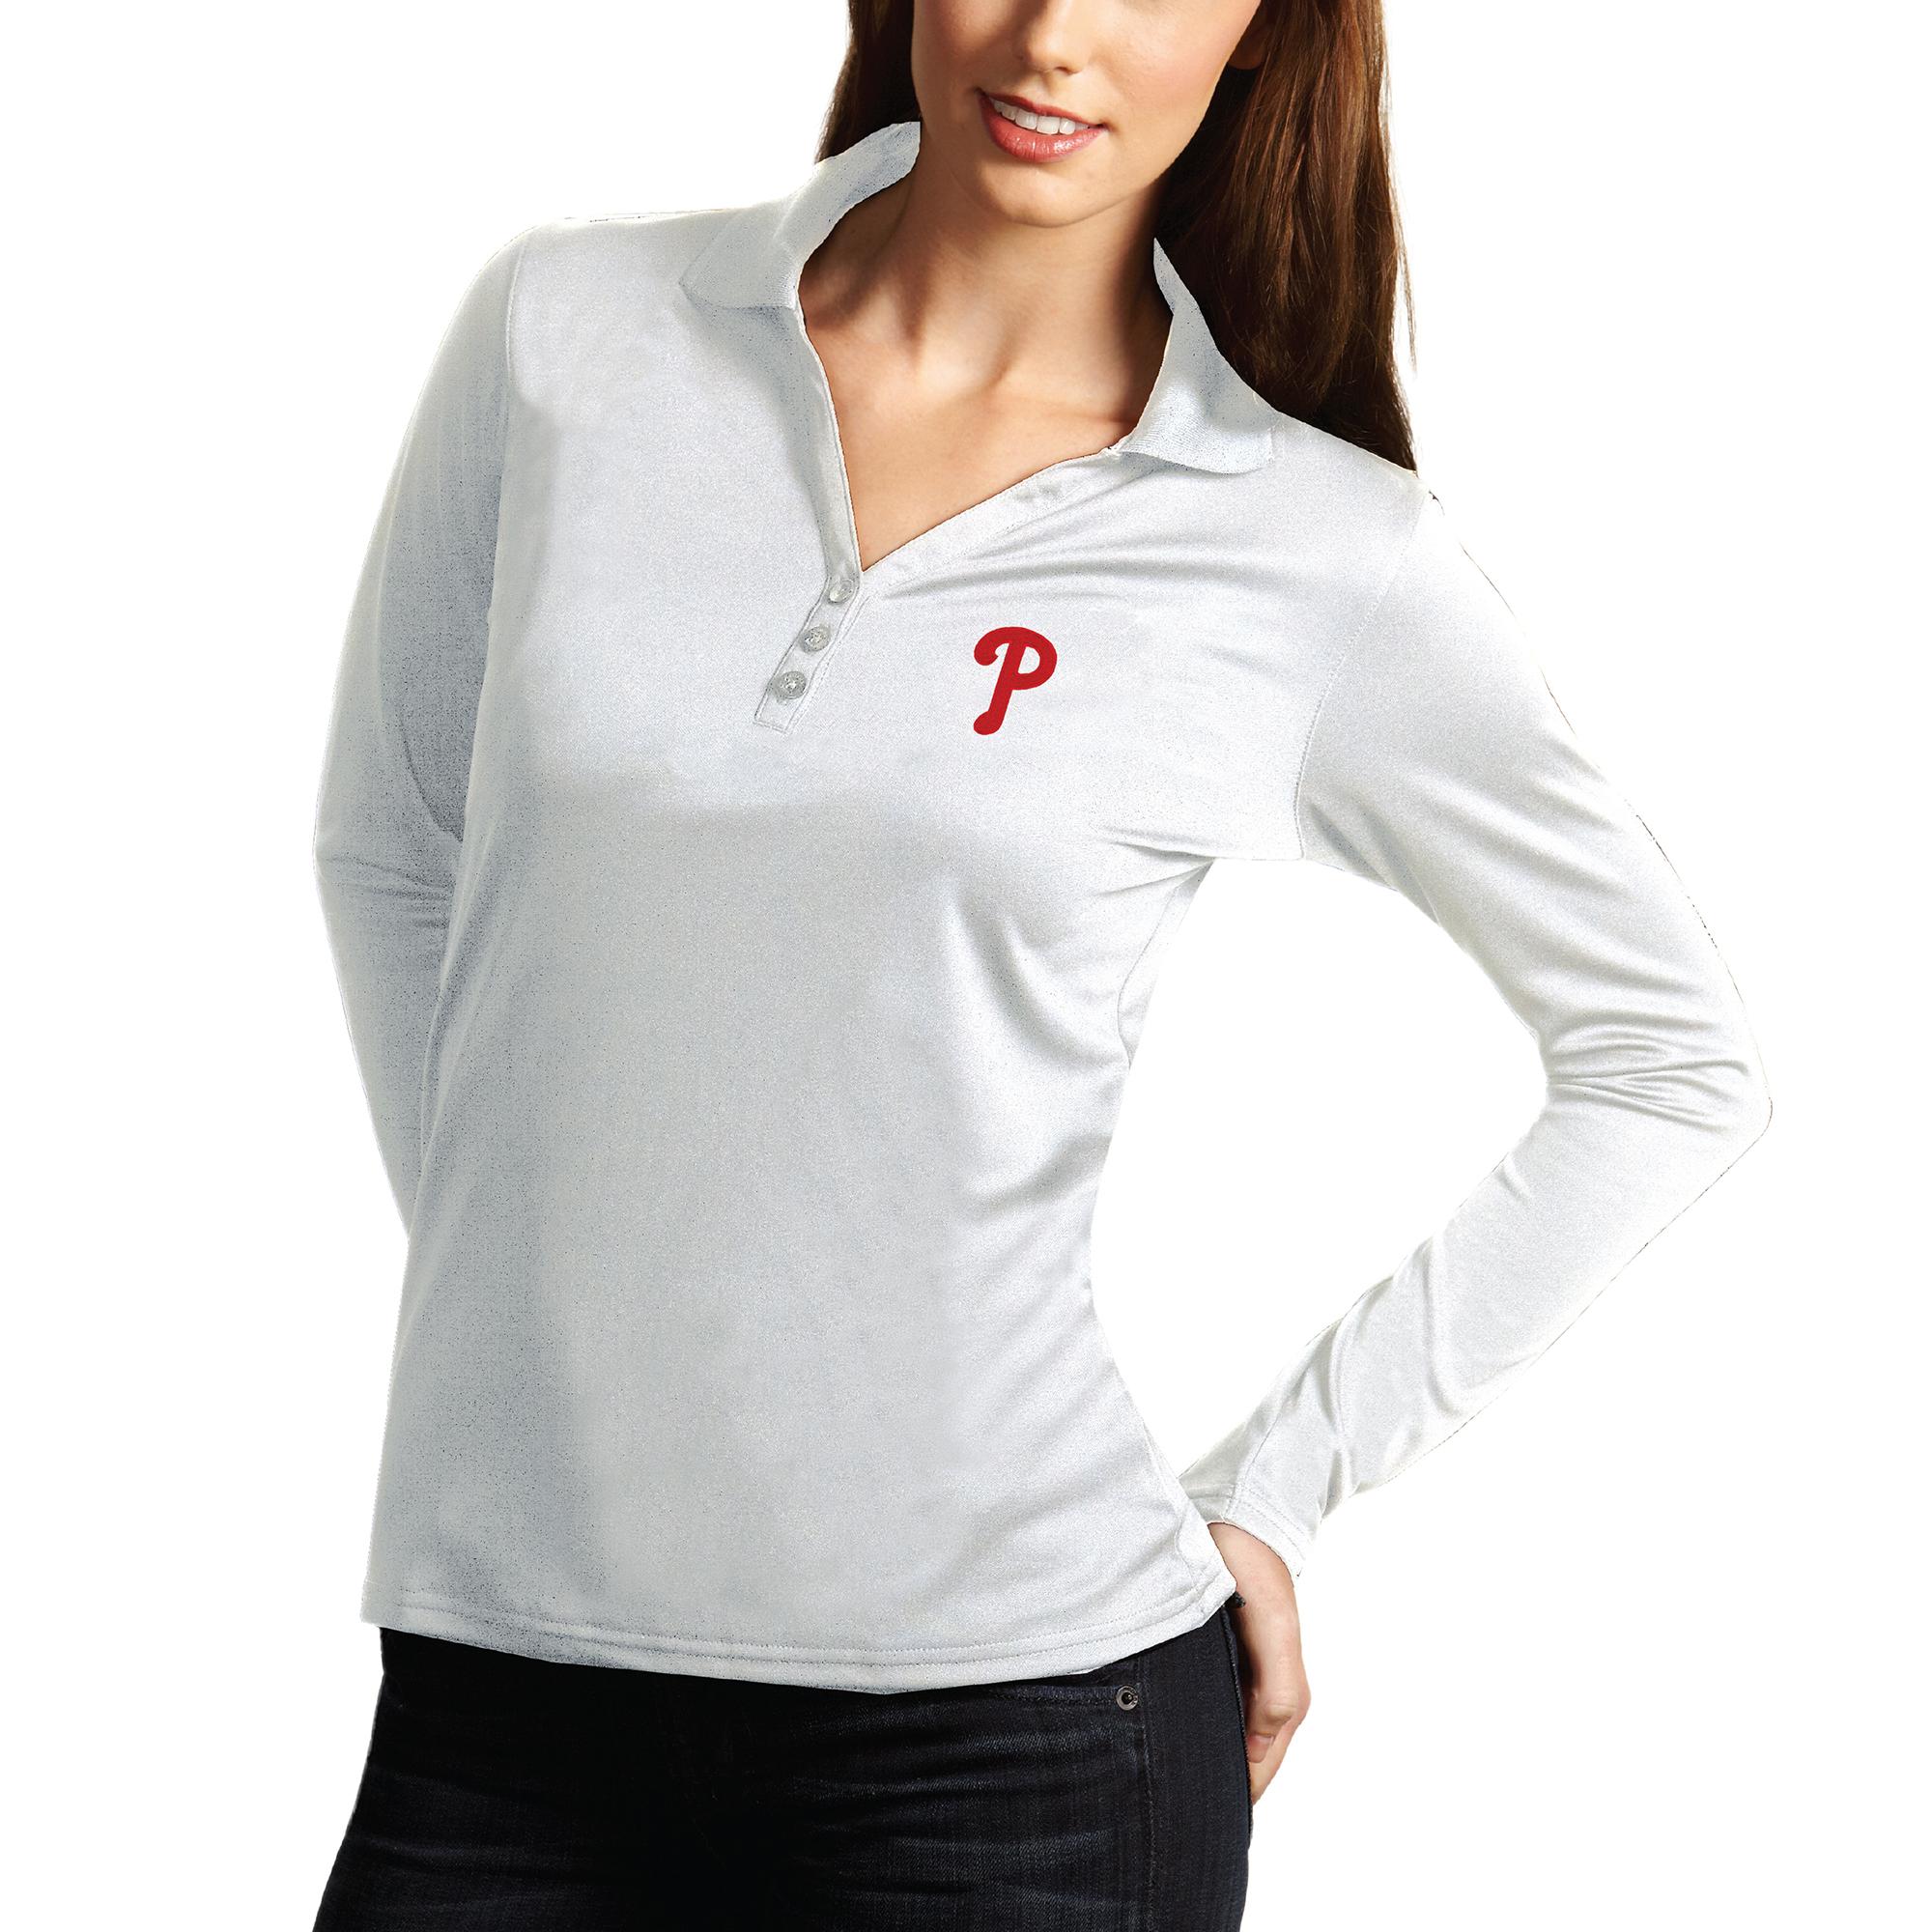 Philadelphia Phillies Antigua Women's Desert Dry Xtra Lite Exceed Long Sleeve Polo - White